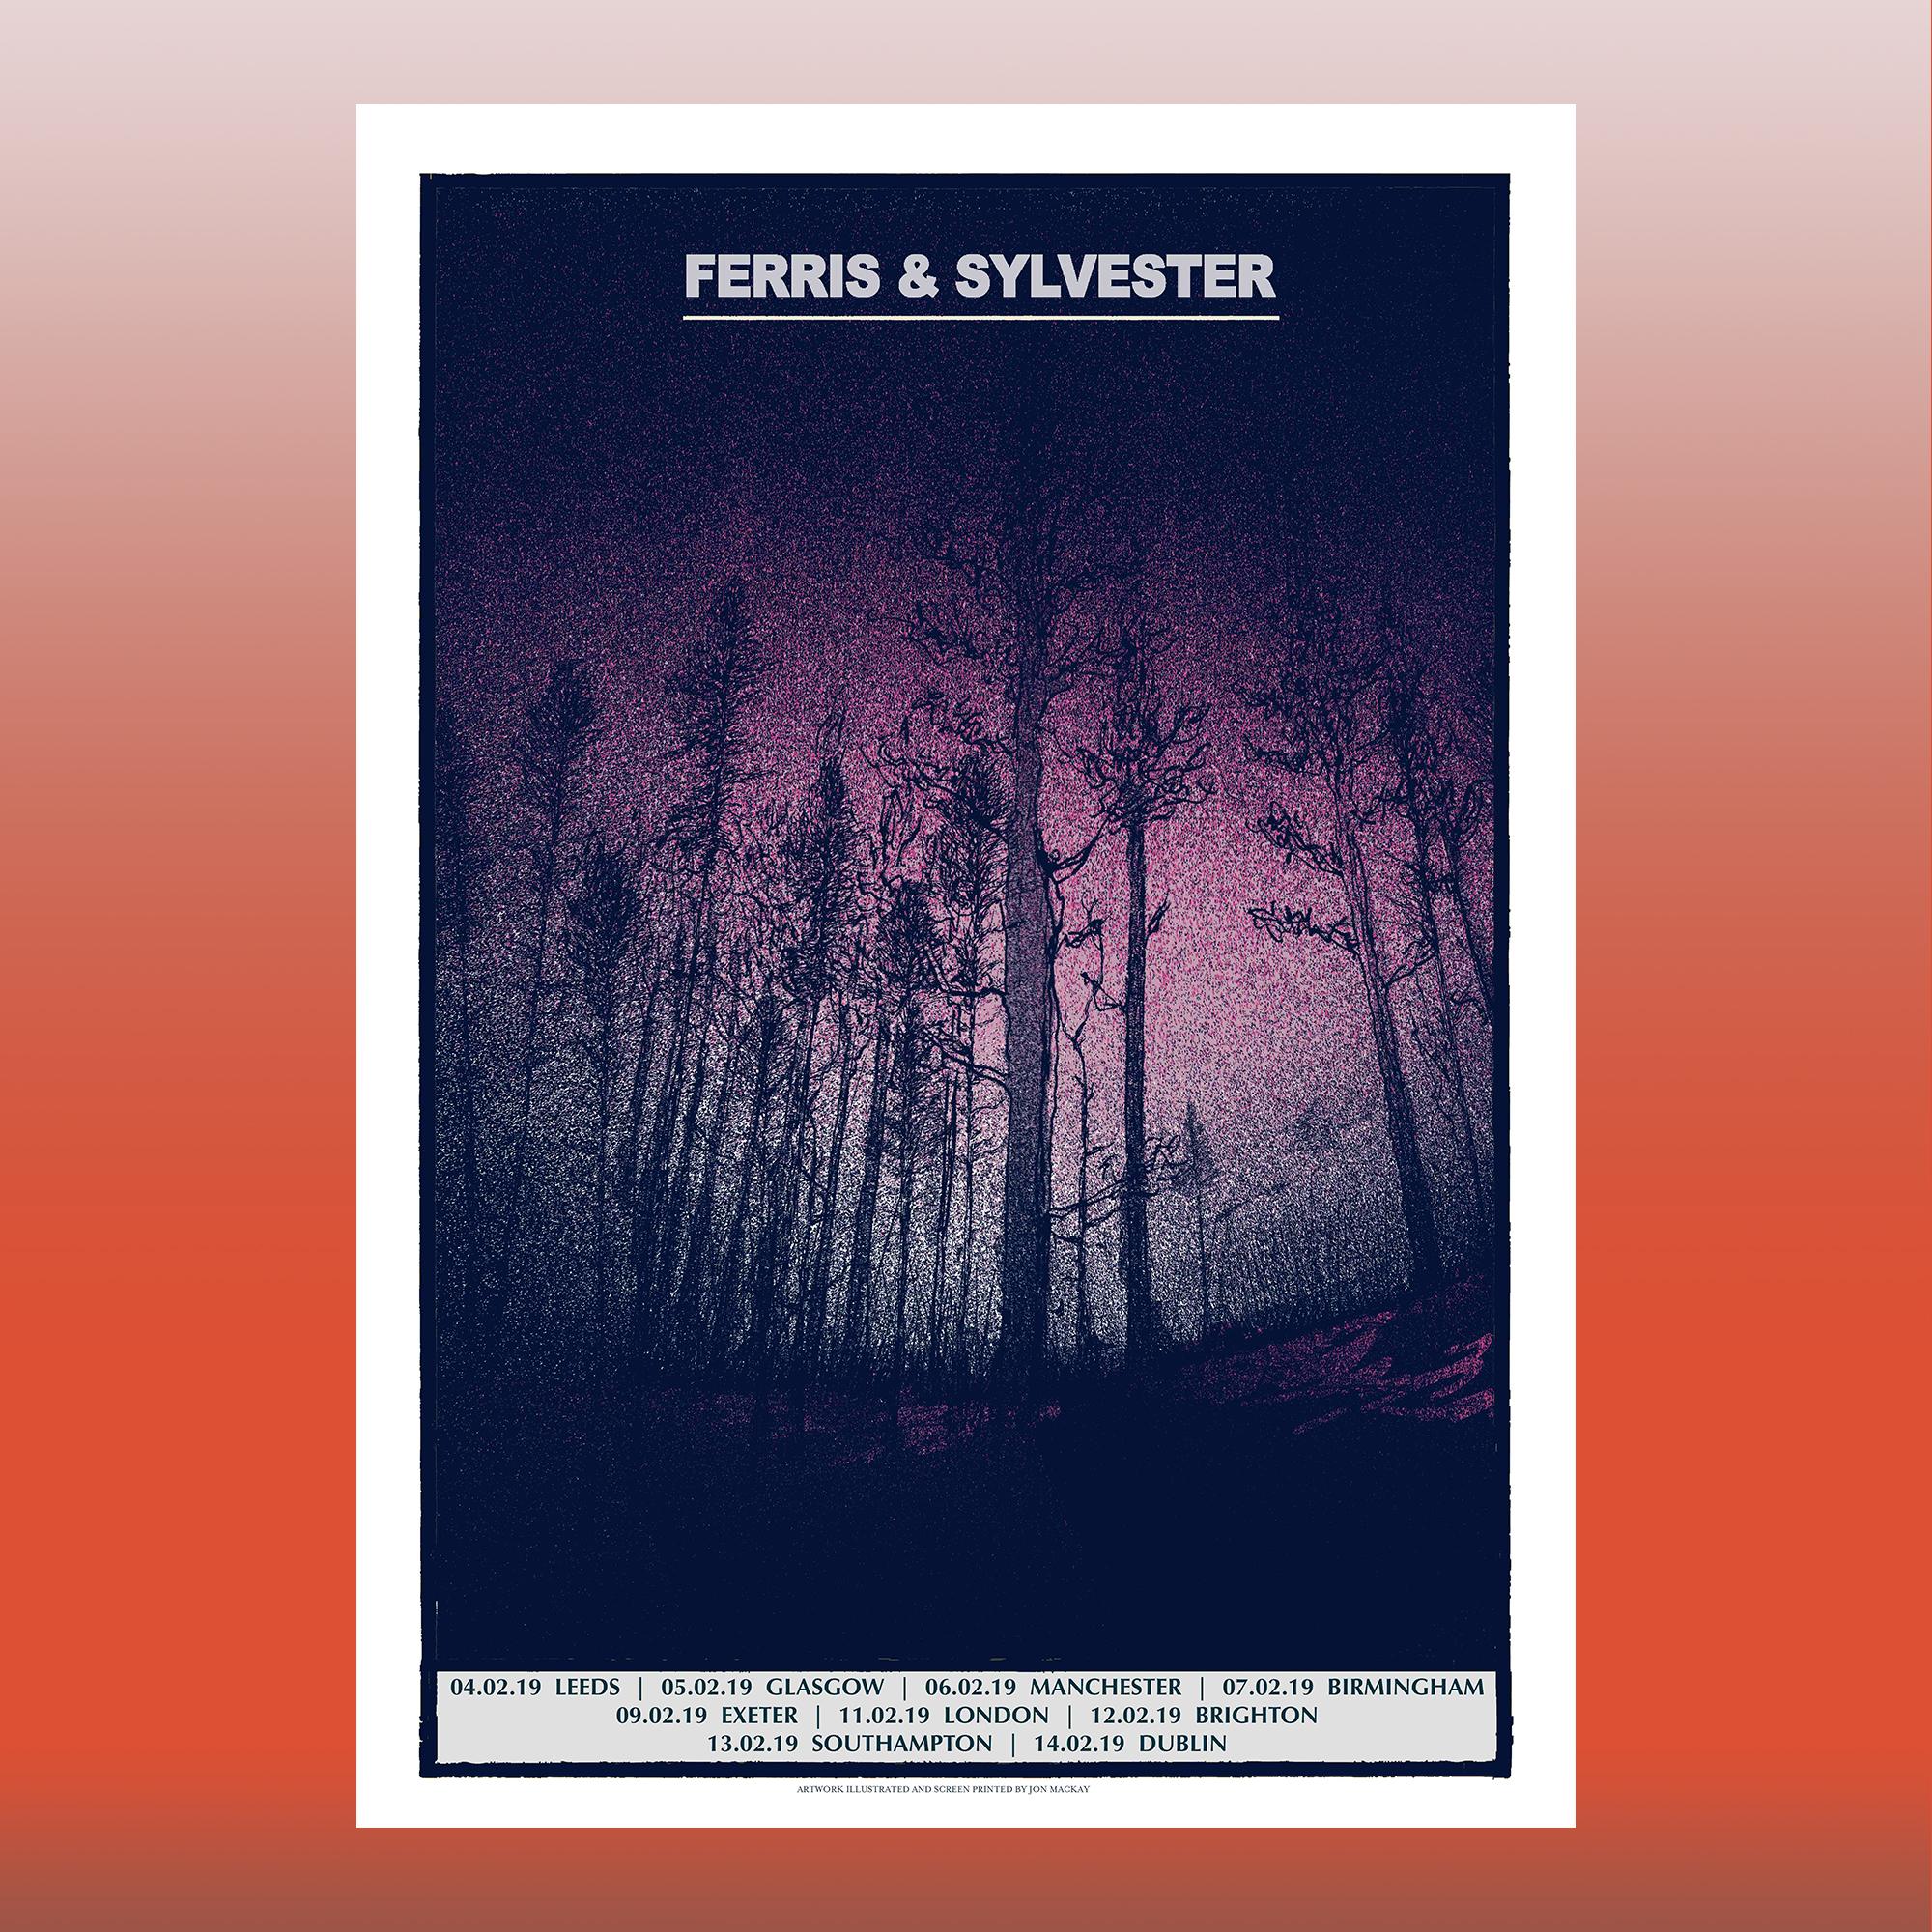 Limited Edition Tour Prints by Jon Mackay - Ferris & Sylvester